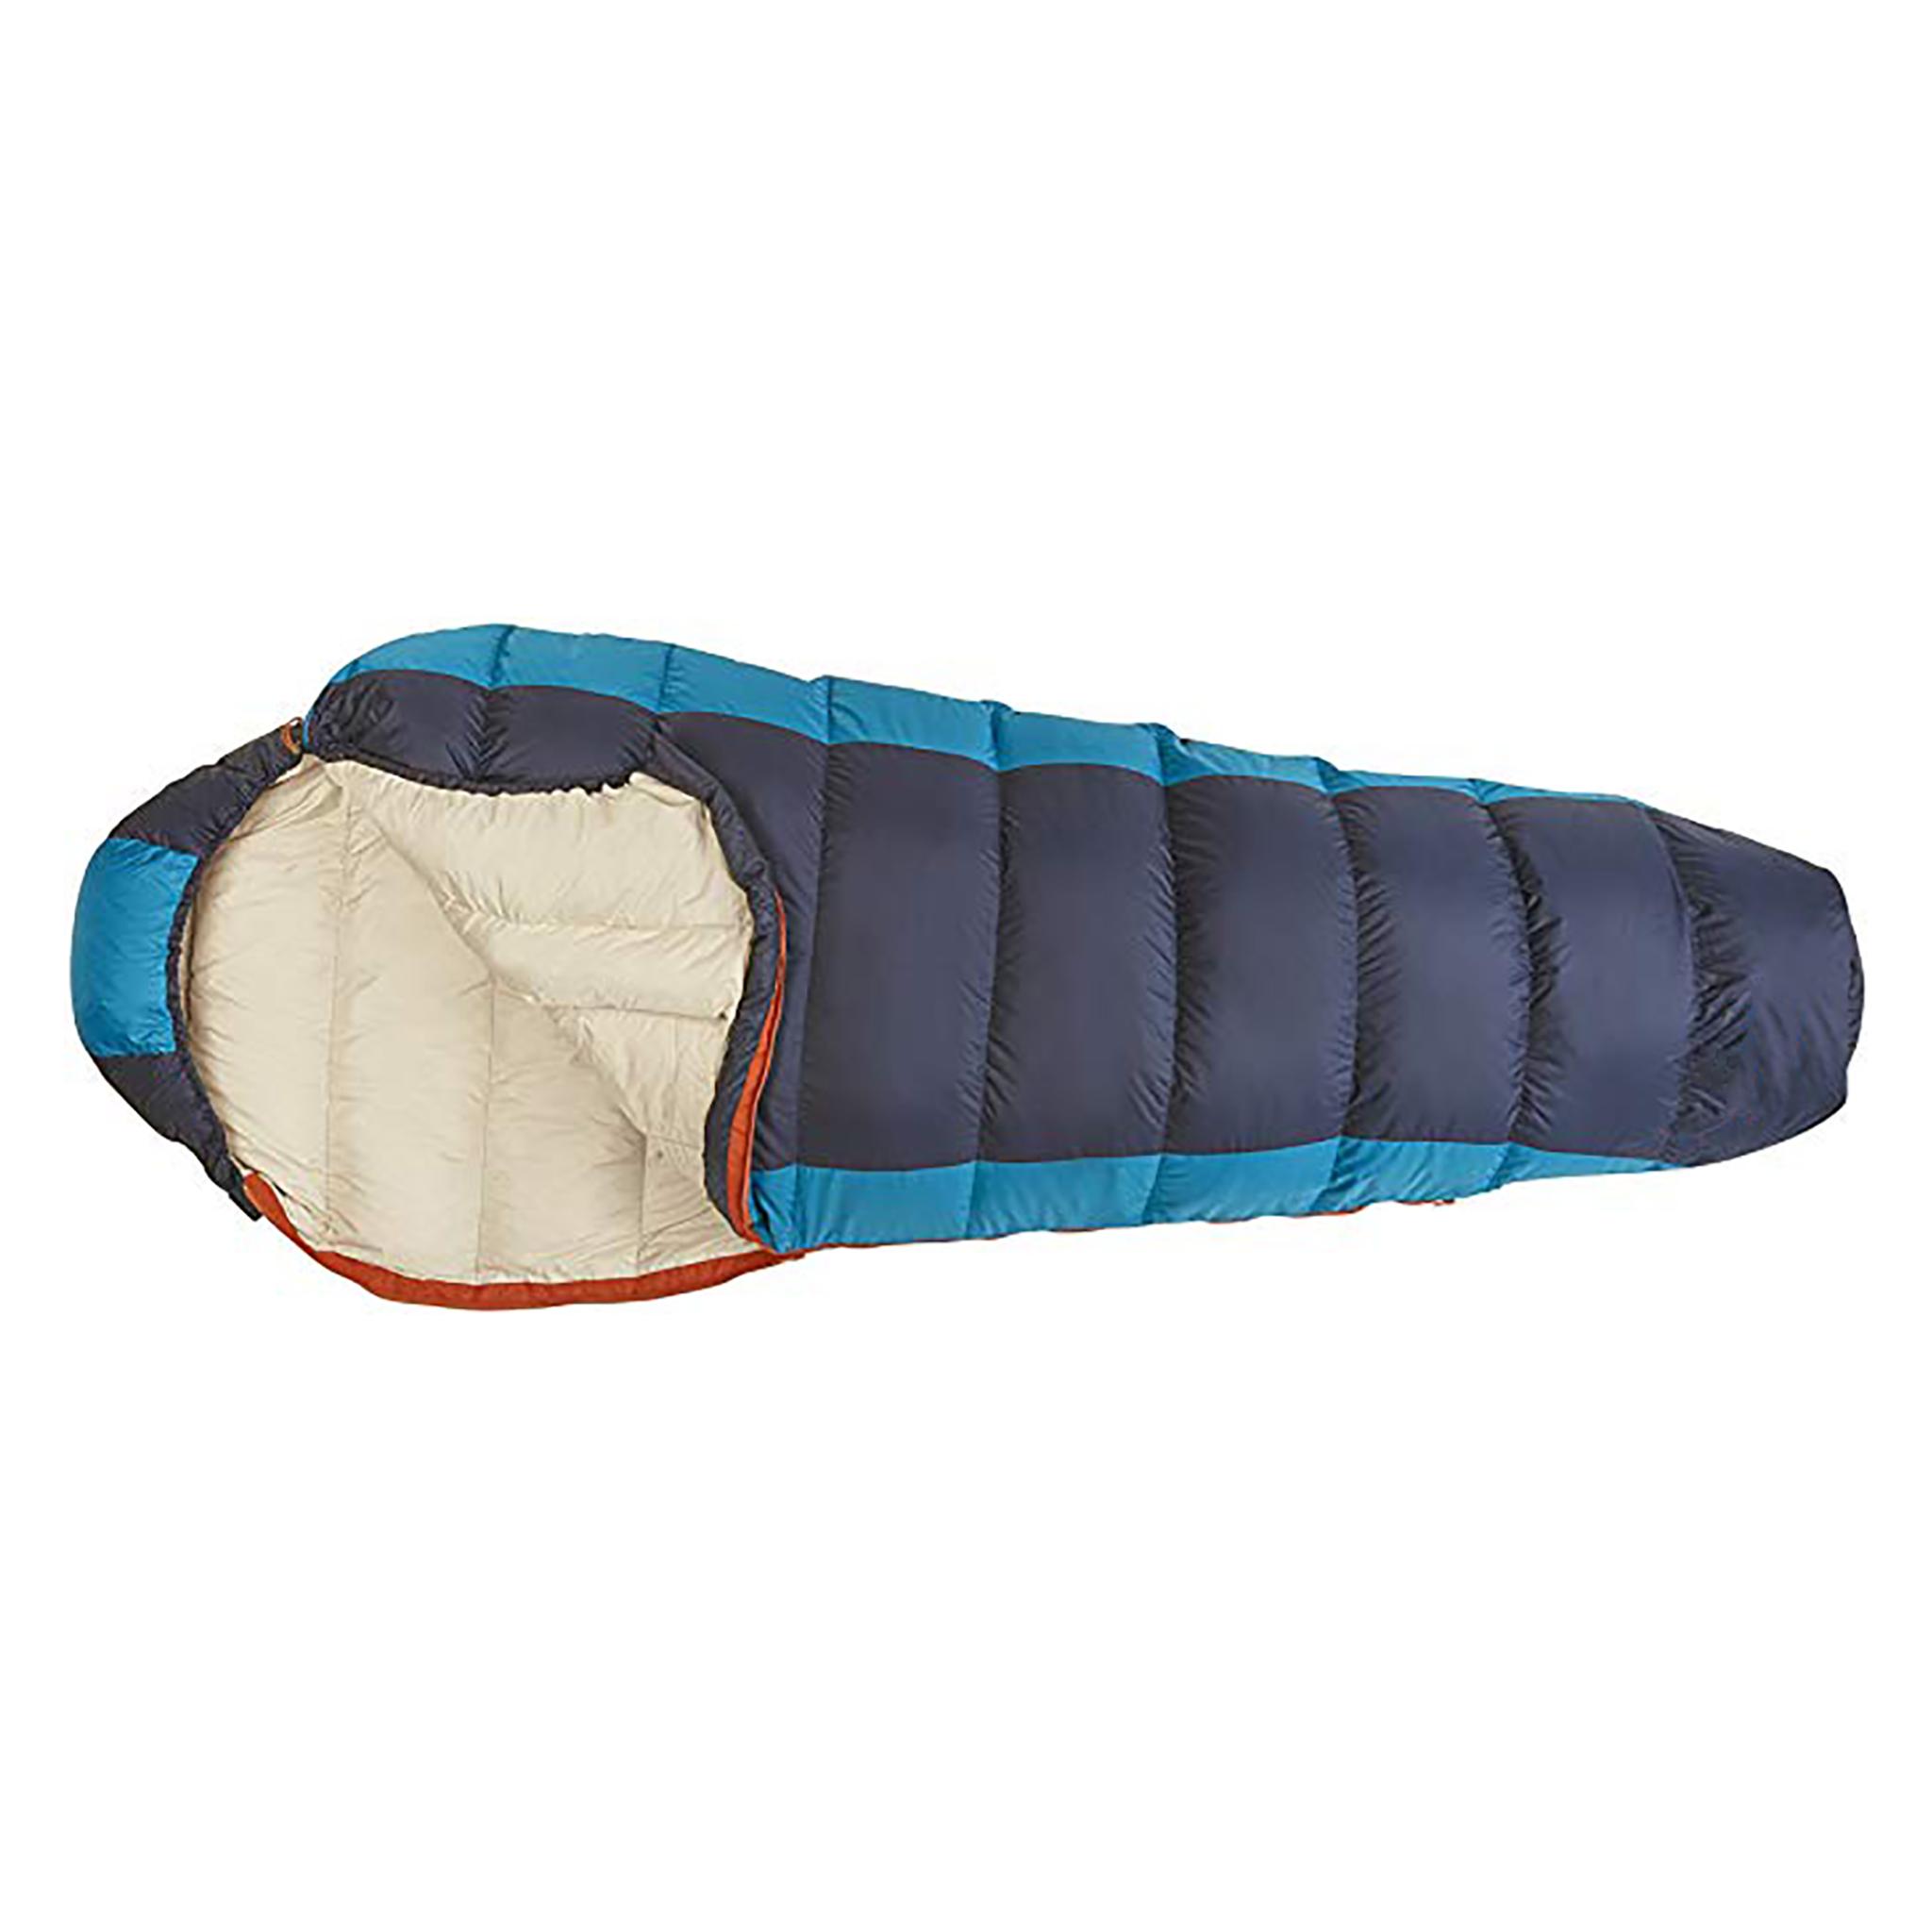 Jailbird Down Sleeping Bag 30 - 40 degree, Mummy-2